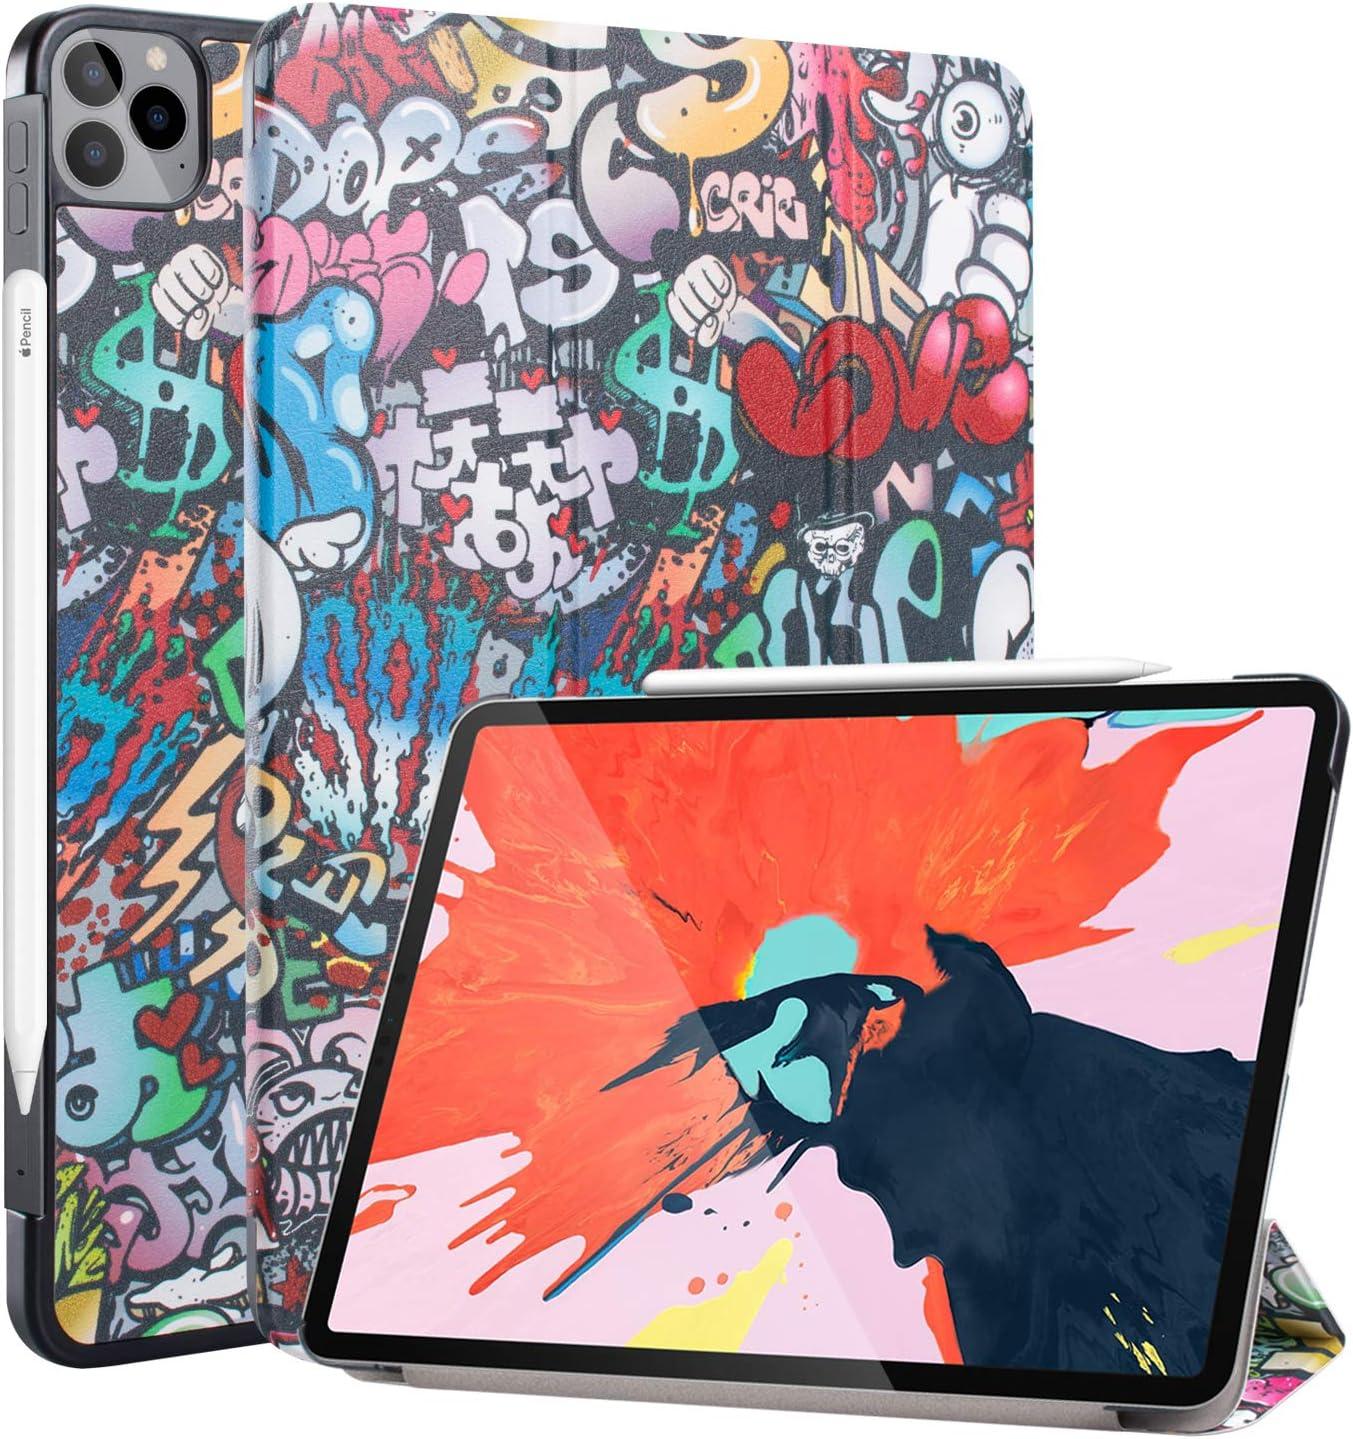 Neepanda Case for New iPad Pro 11 2020 2nd Generation, [Support Apple Pencil Charging] Slim Lightweight Smart Tri-Fold Stand Case for iPad Pro 11 inch 2nd Gen 2020, Auto Wake/Sleep, Graffiti